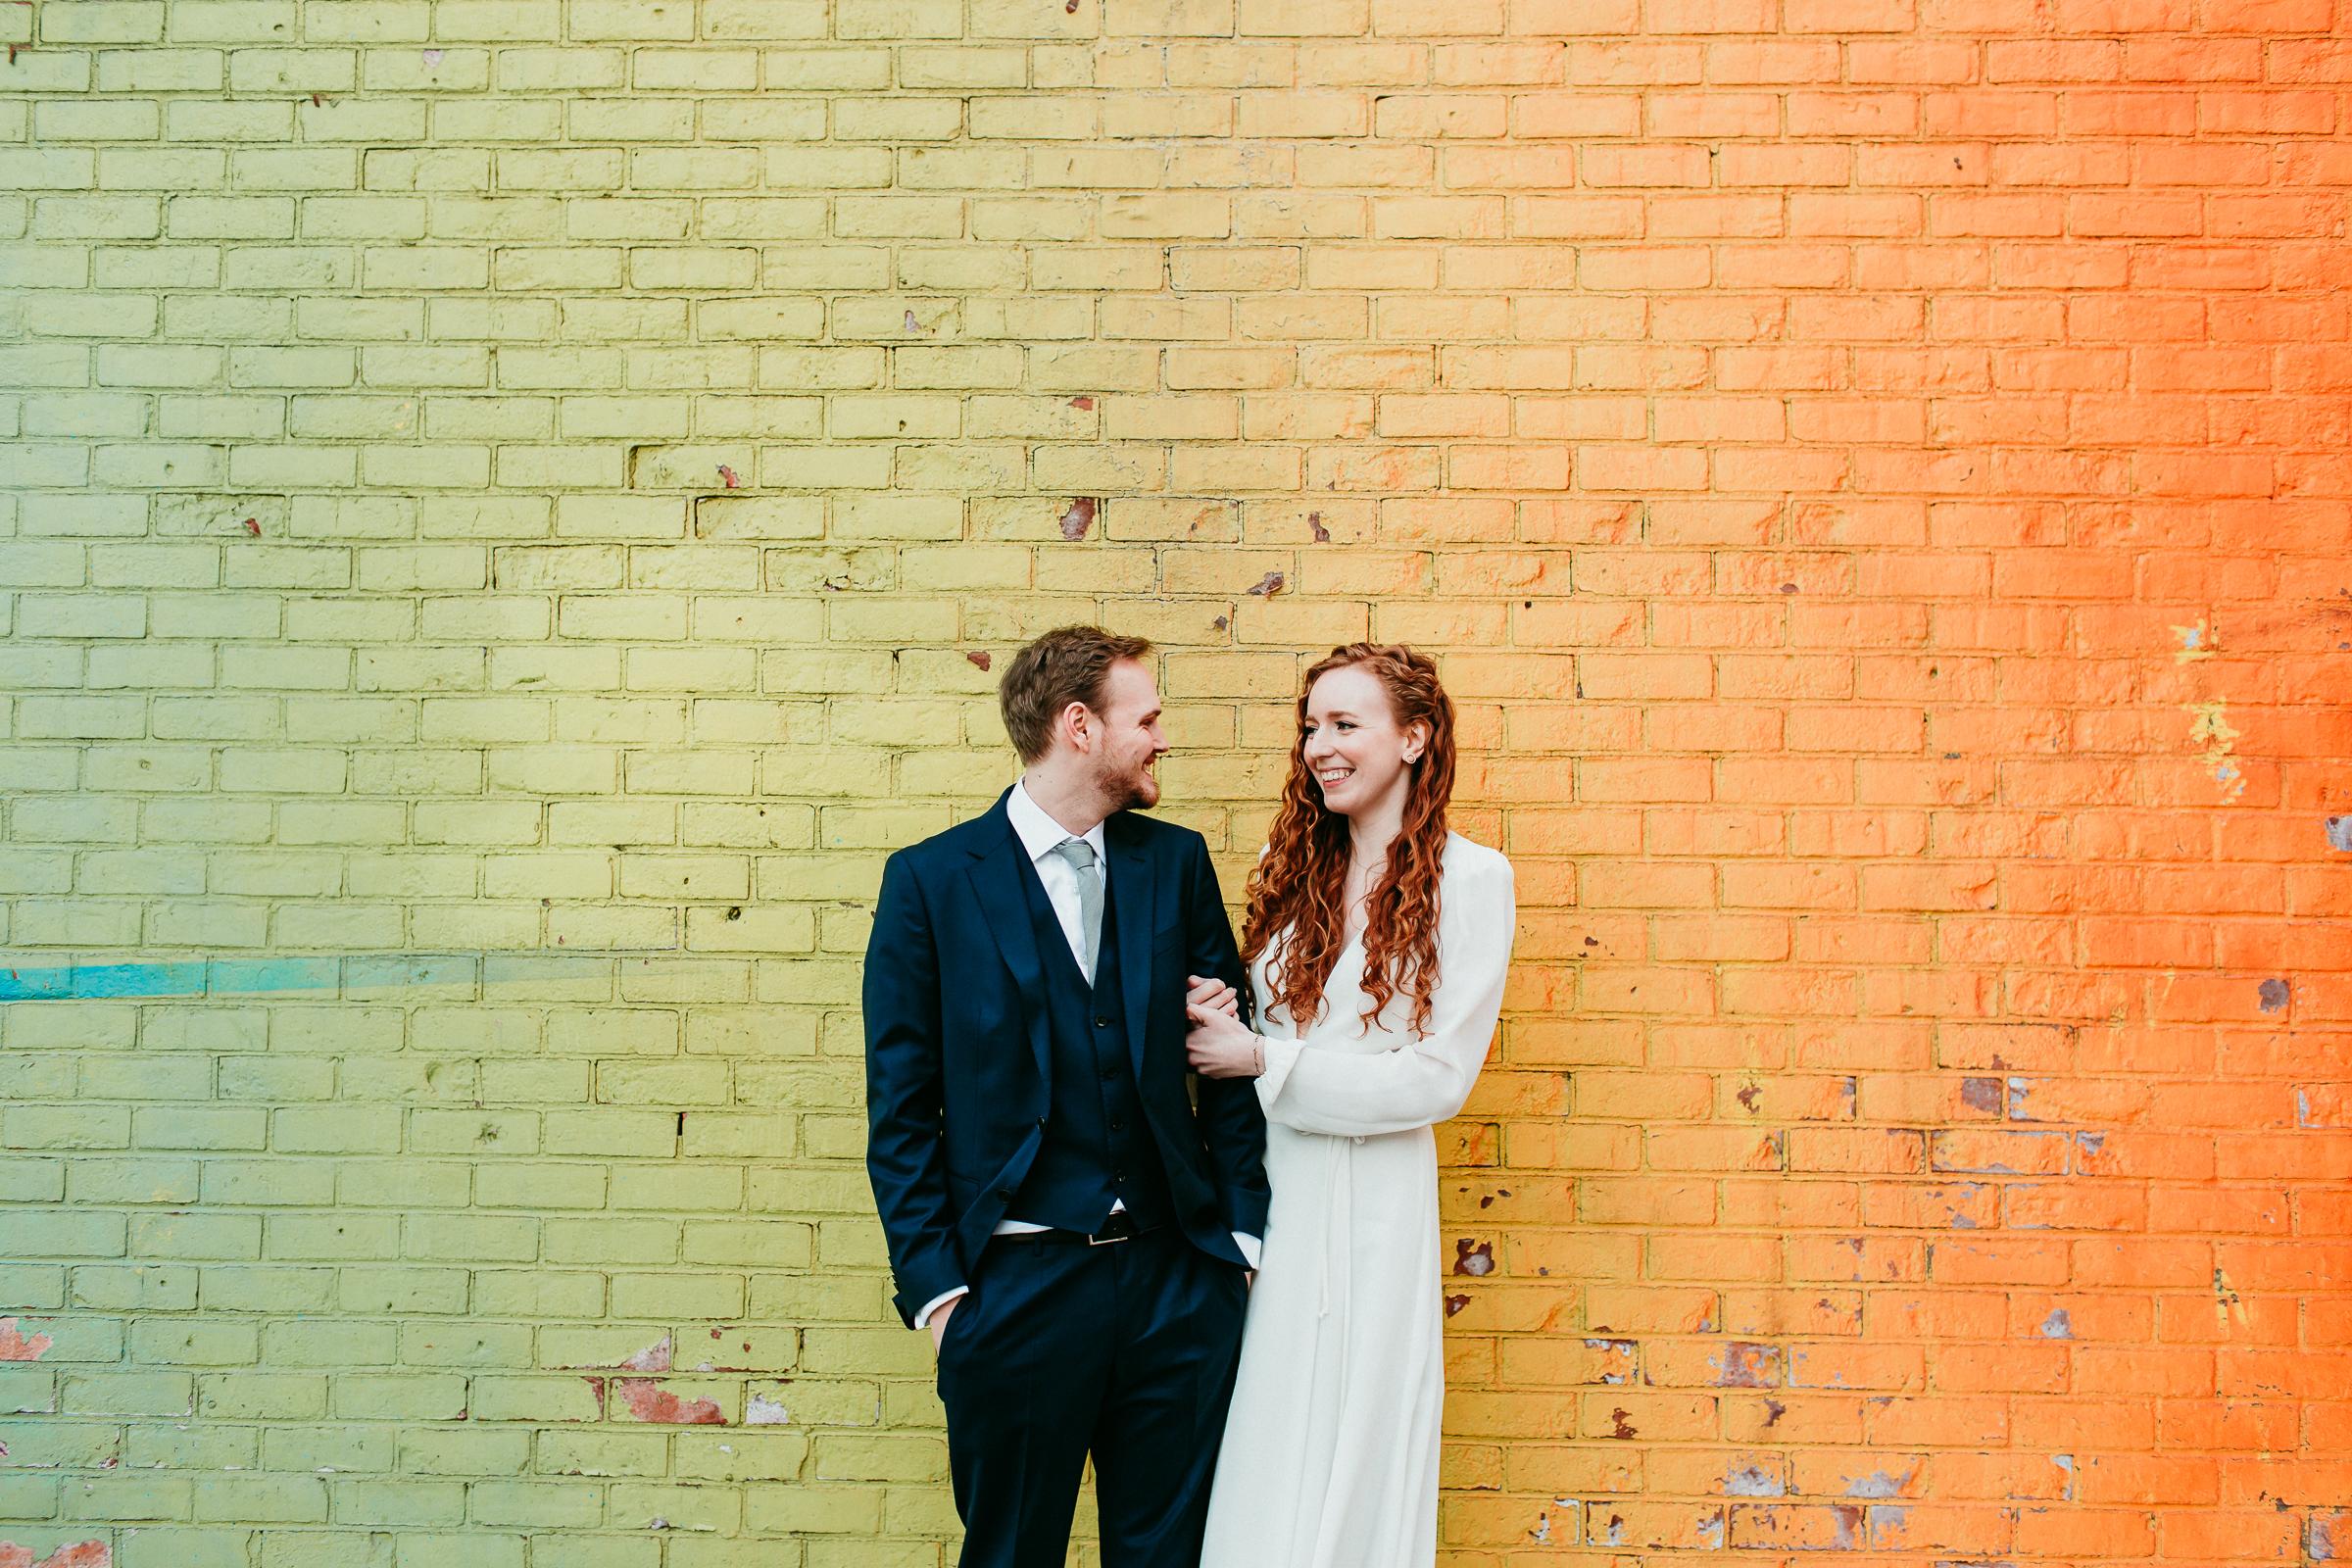 Freemans-Restaurant-Soho-Brooklyn-Bridge-Park-Dumbo-Documentary-Wedding-Photographer-1.jpg